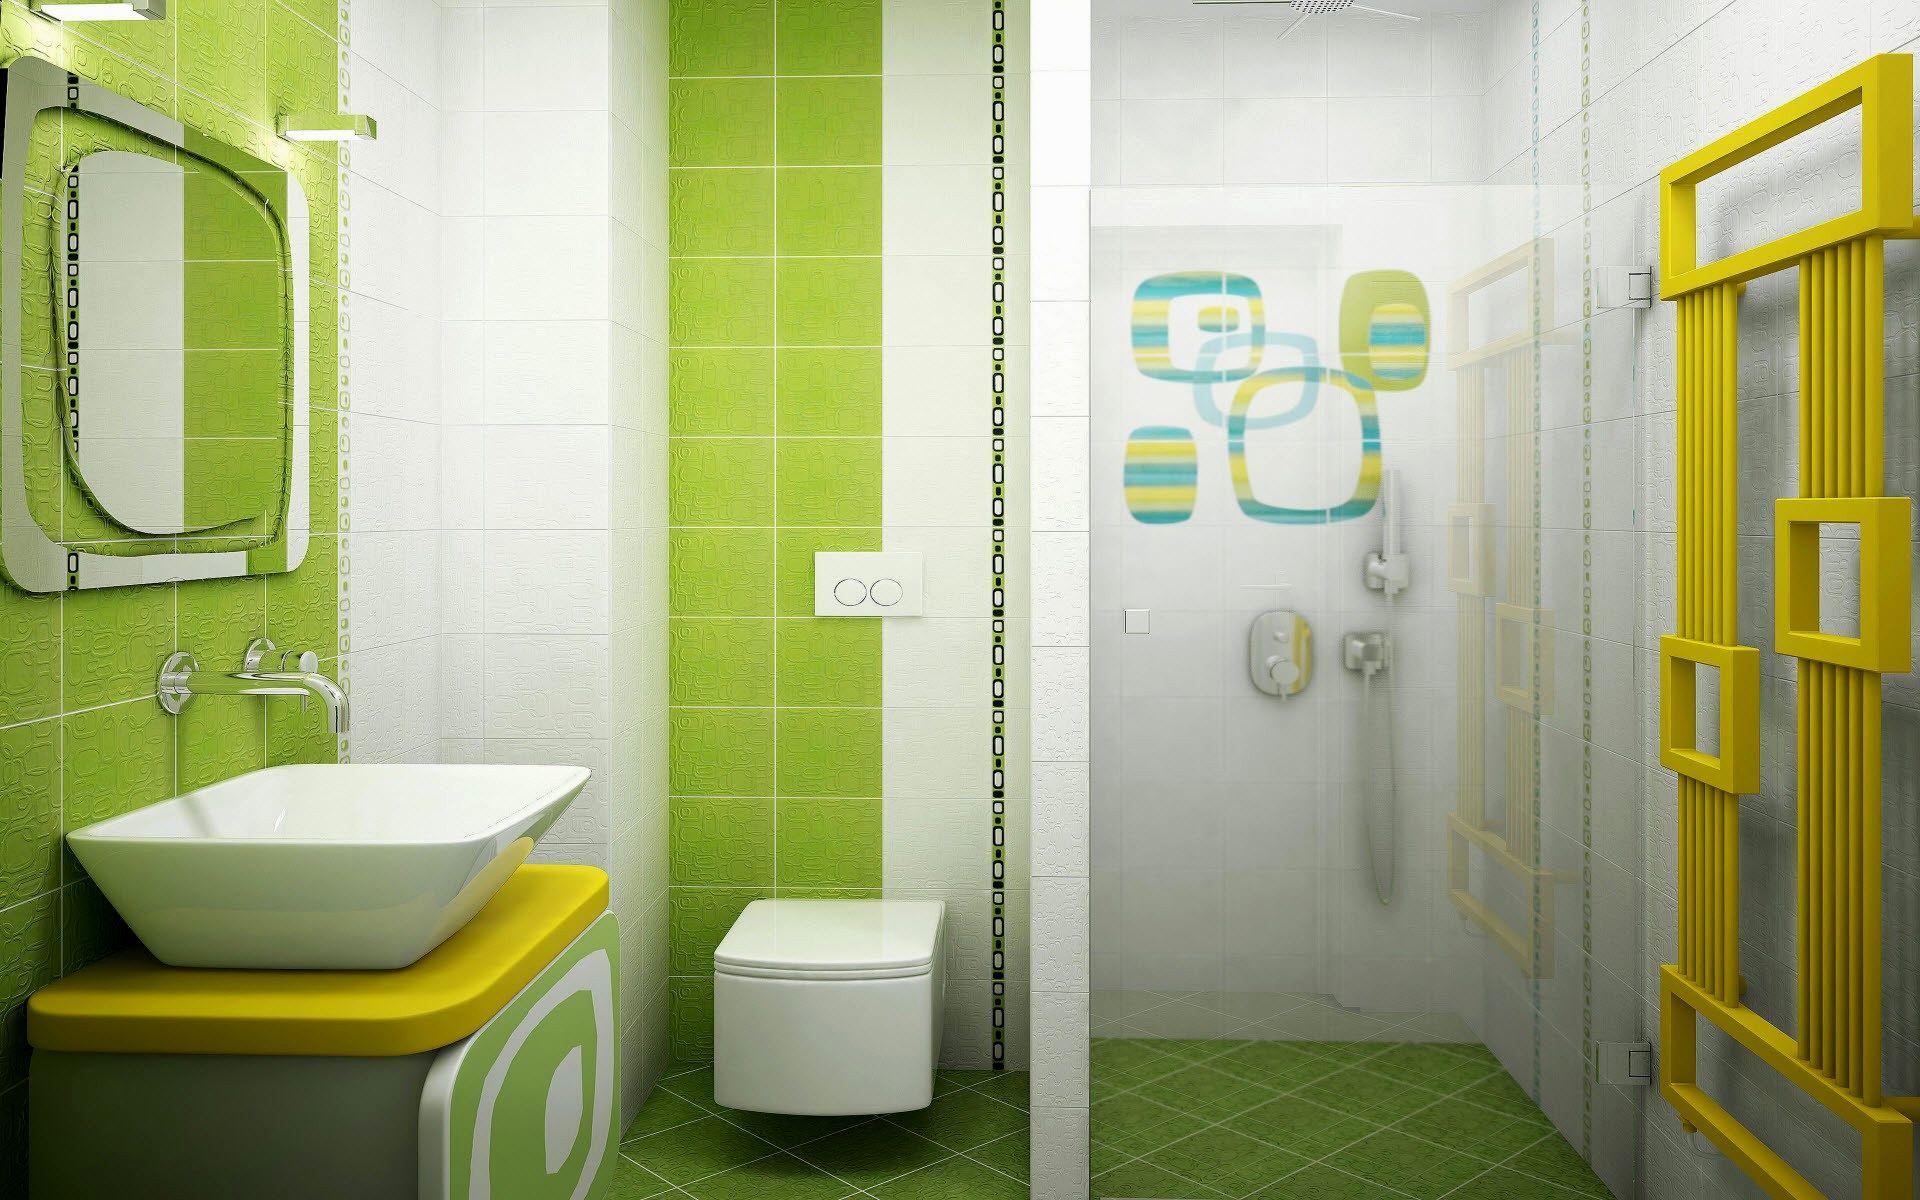 latest bathroom floor tiles model-Best Bathroom Floor Tiles Pattern